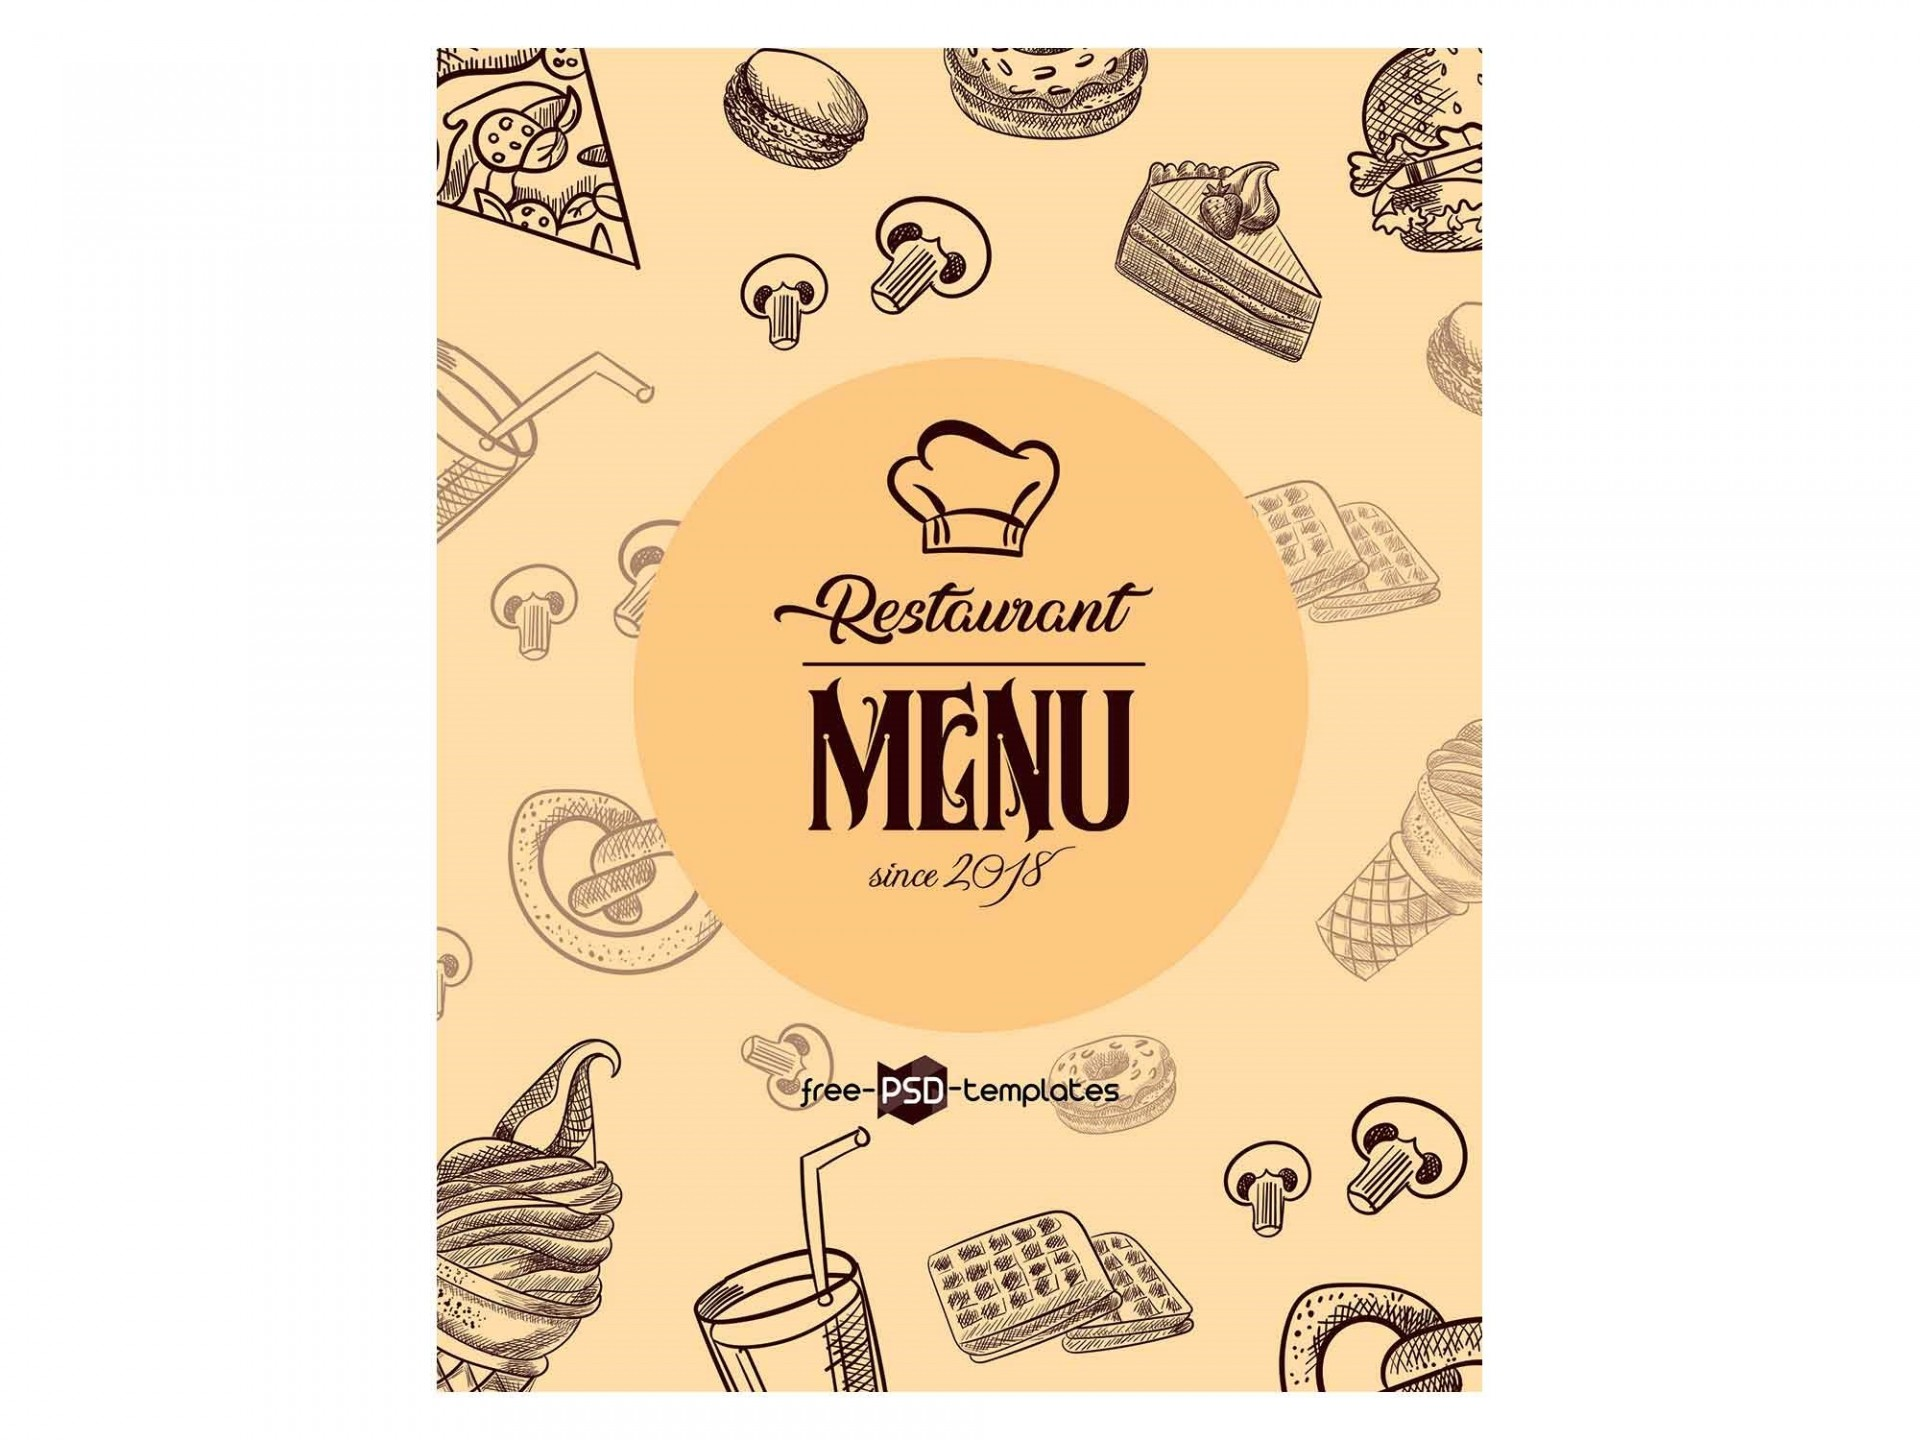 008 Outstanding Blank Restaurant Menu Template Idea  Free Printable Downloadable1920